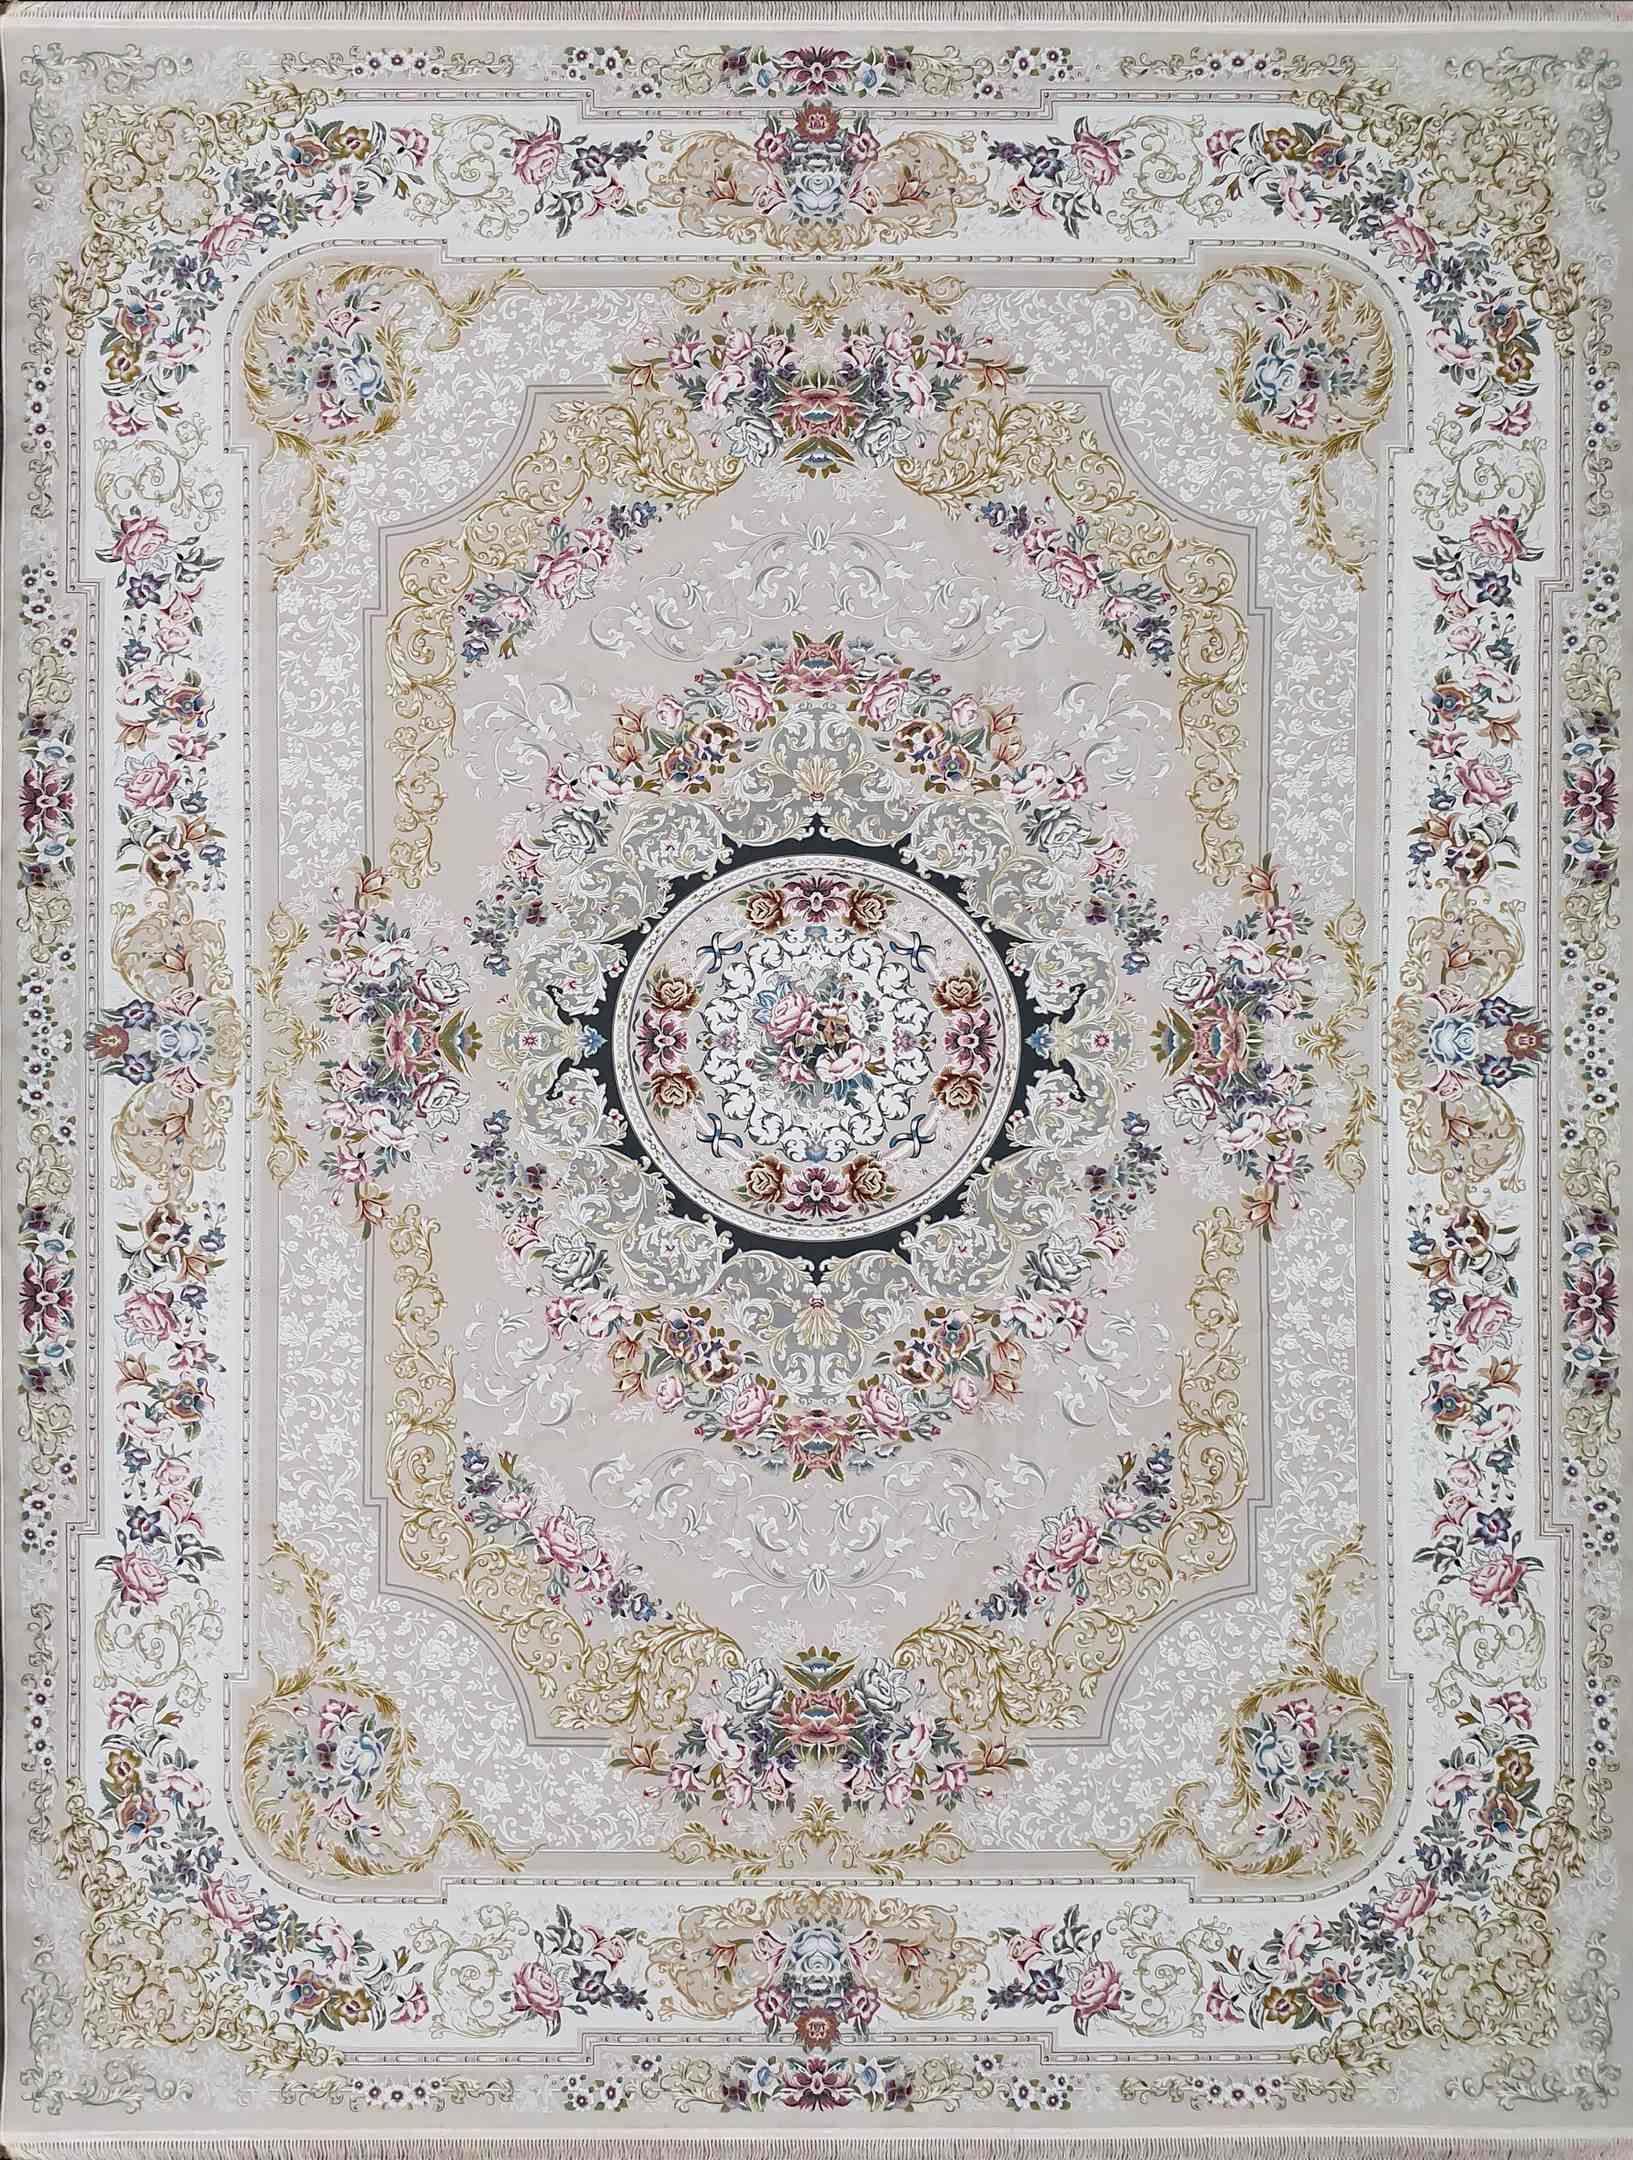 فرش  1200 شانه شانار رنگ کرم گلبرجسته